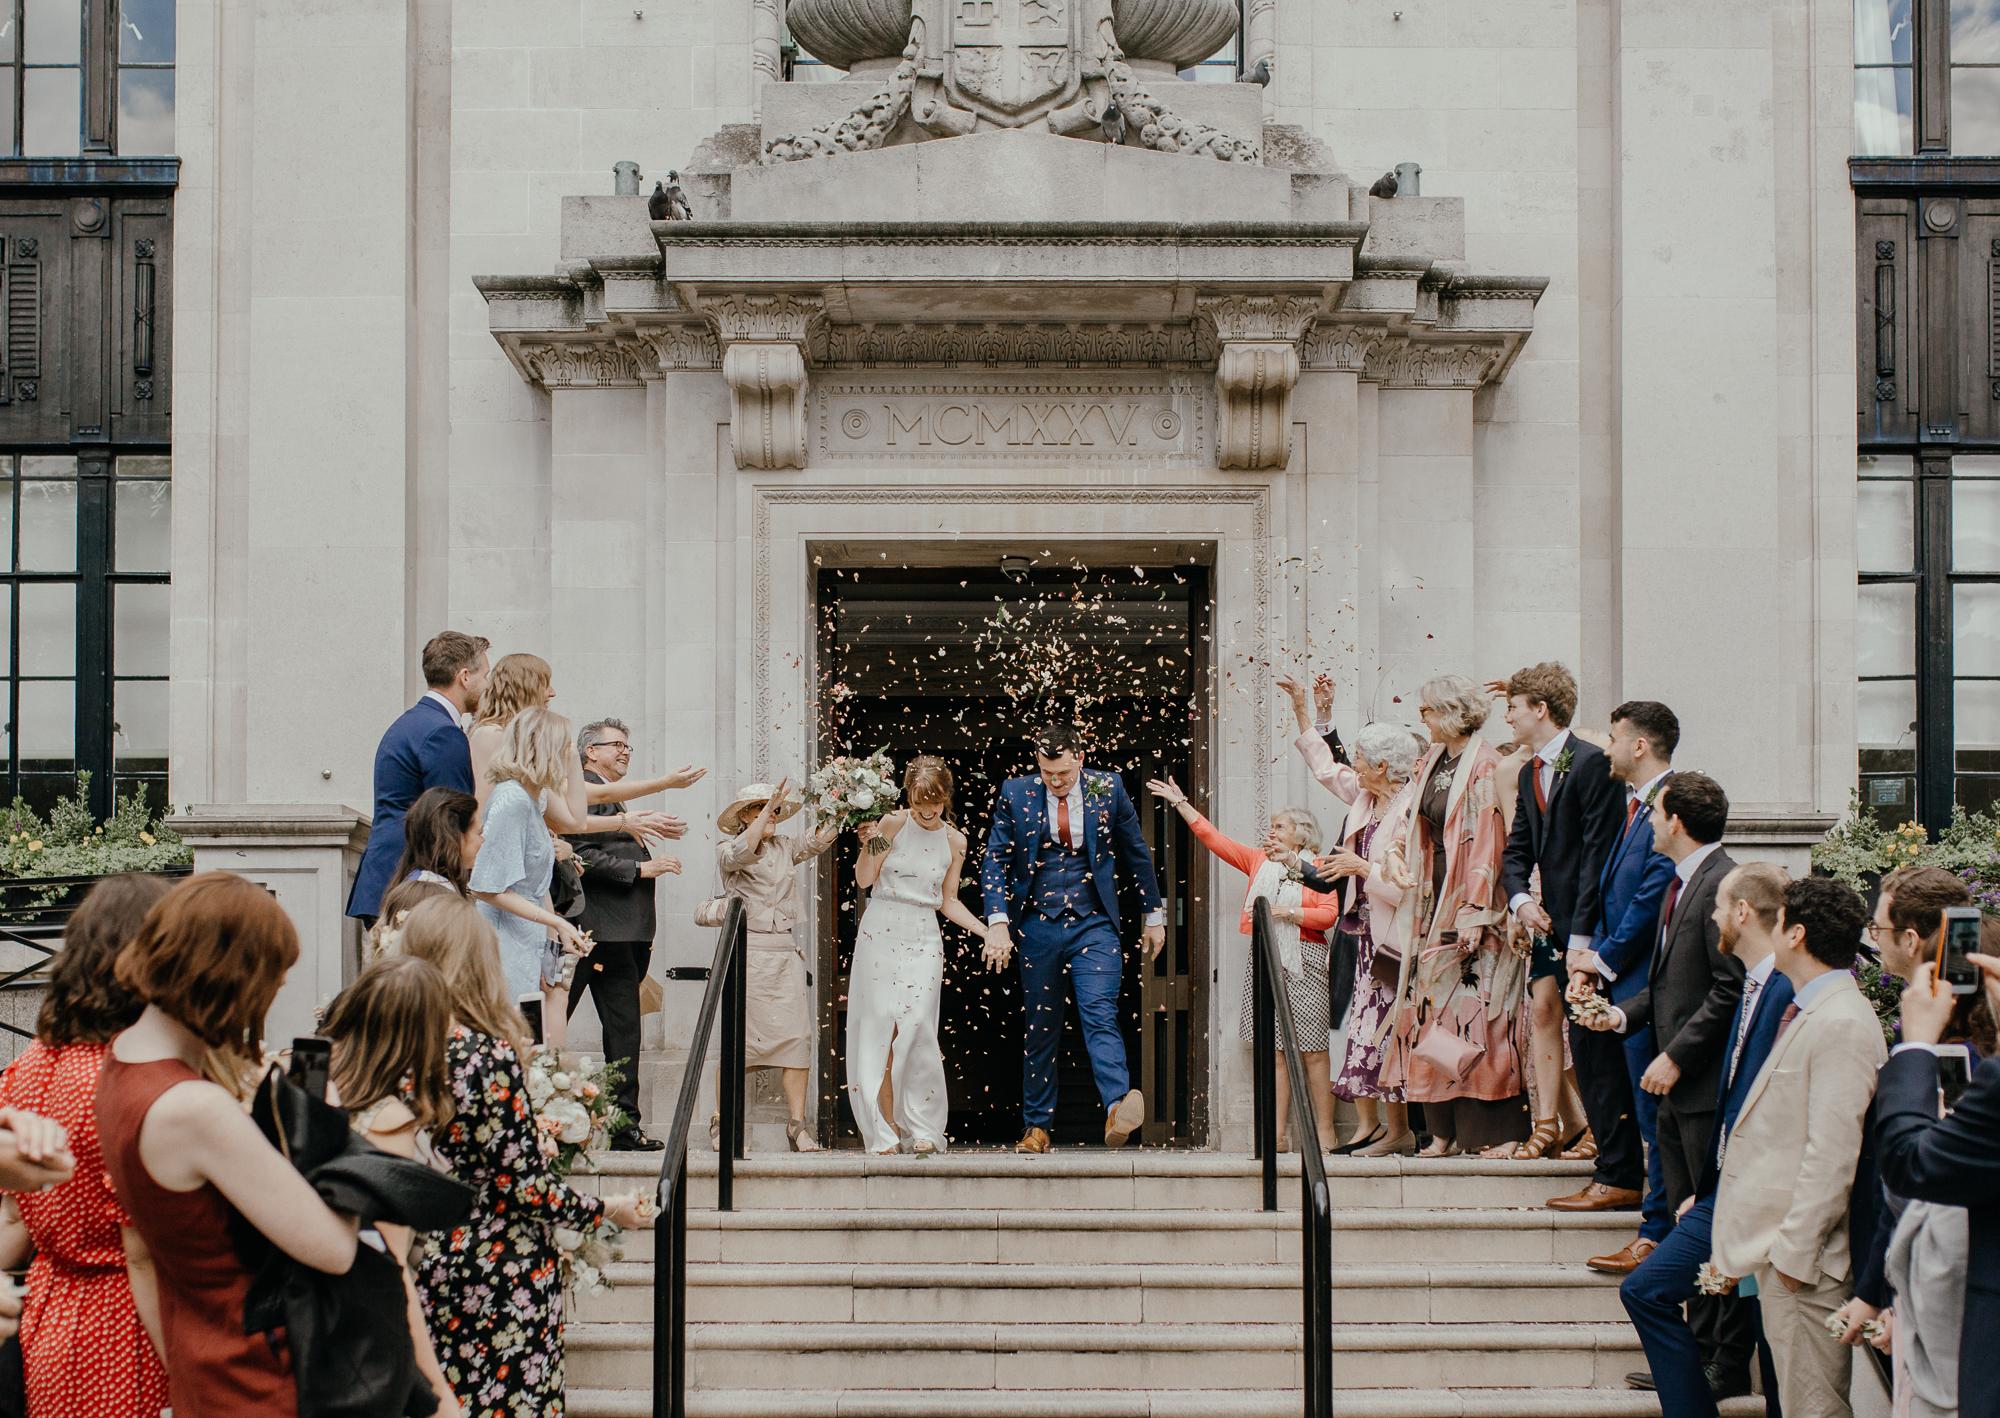 stephanie-green-wedding-photography-sulaflowers-sula-flowers-london-islington-town-hall-depot-n7-71.jpg